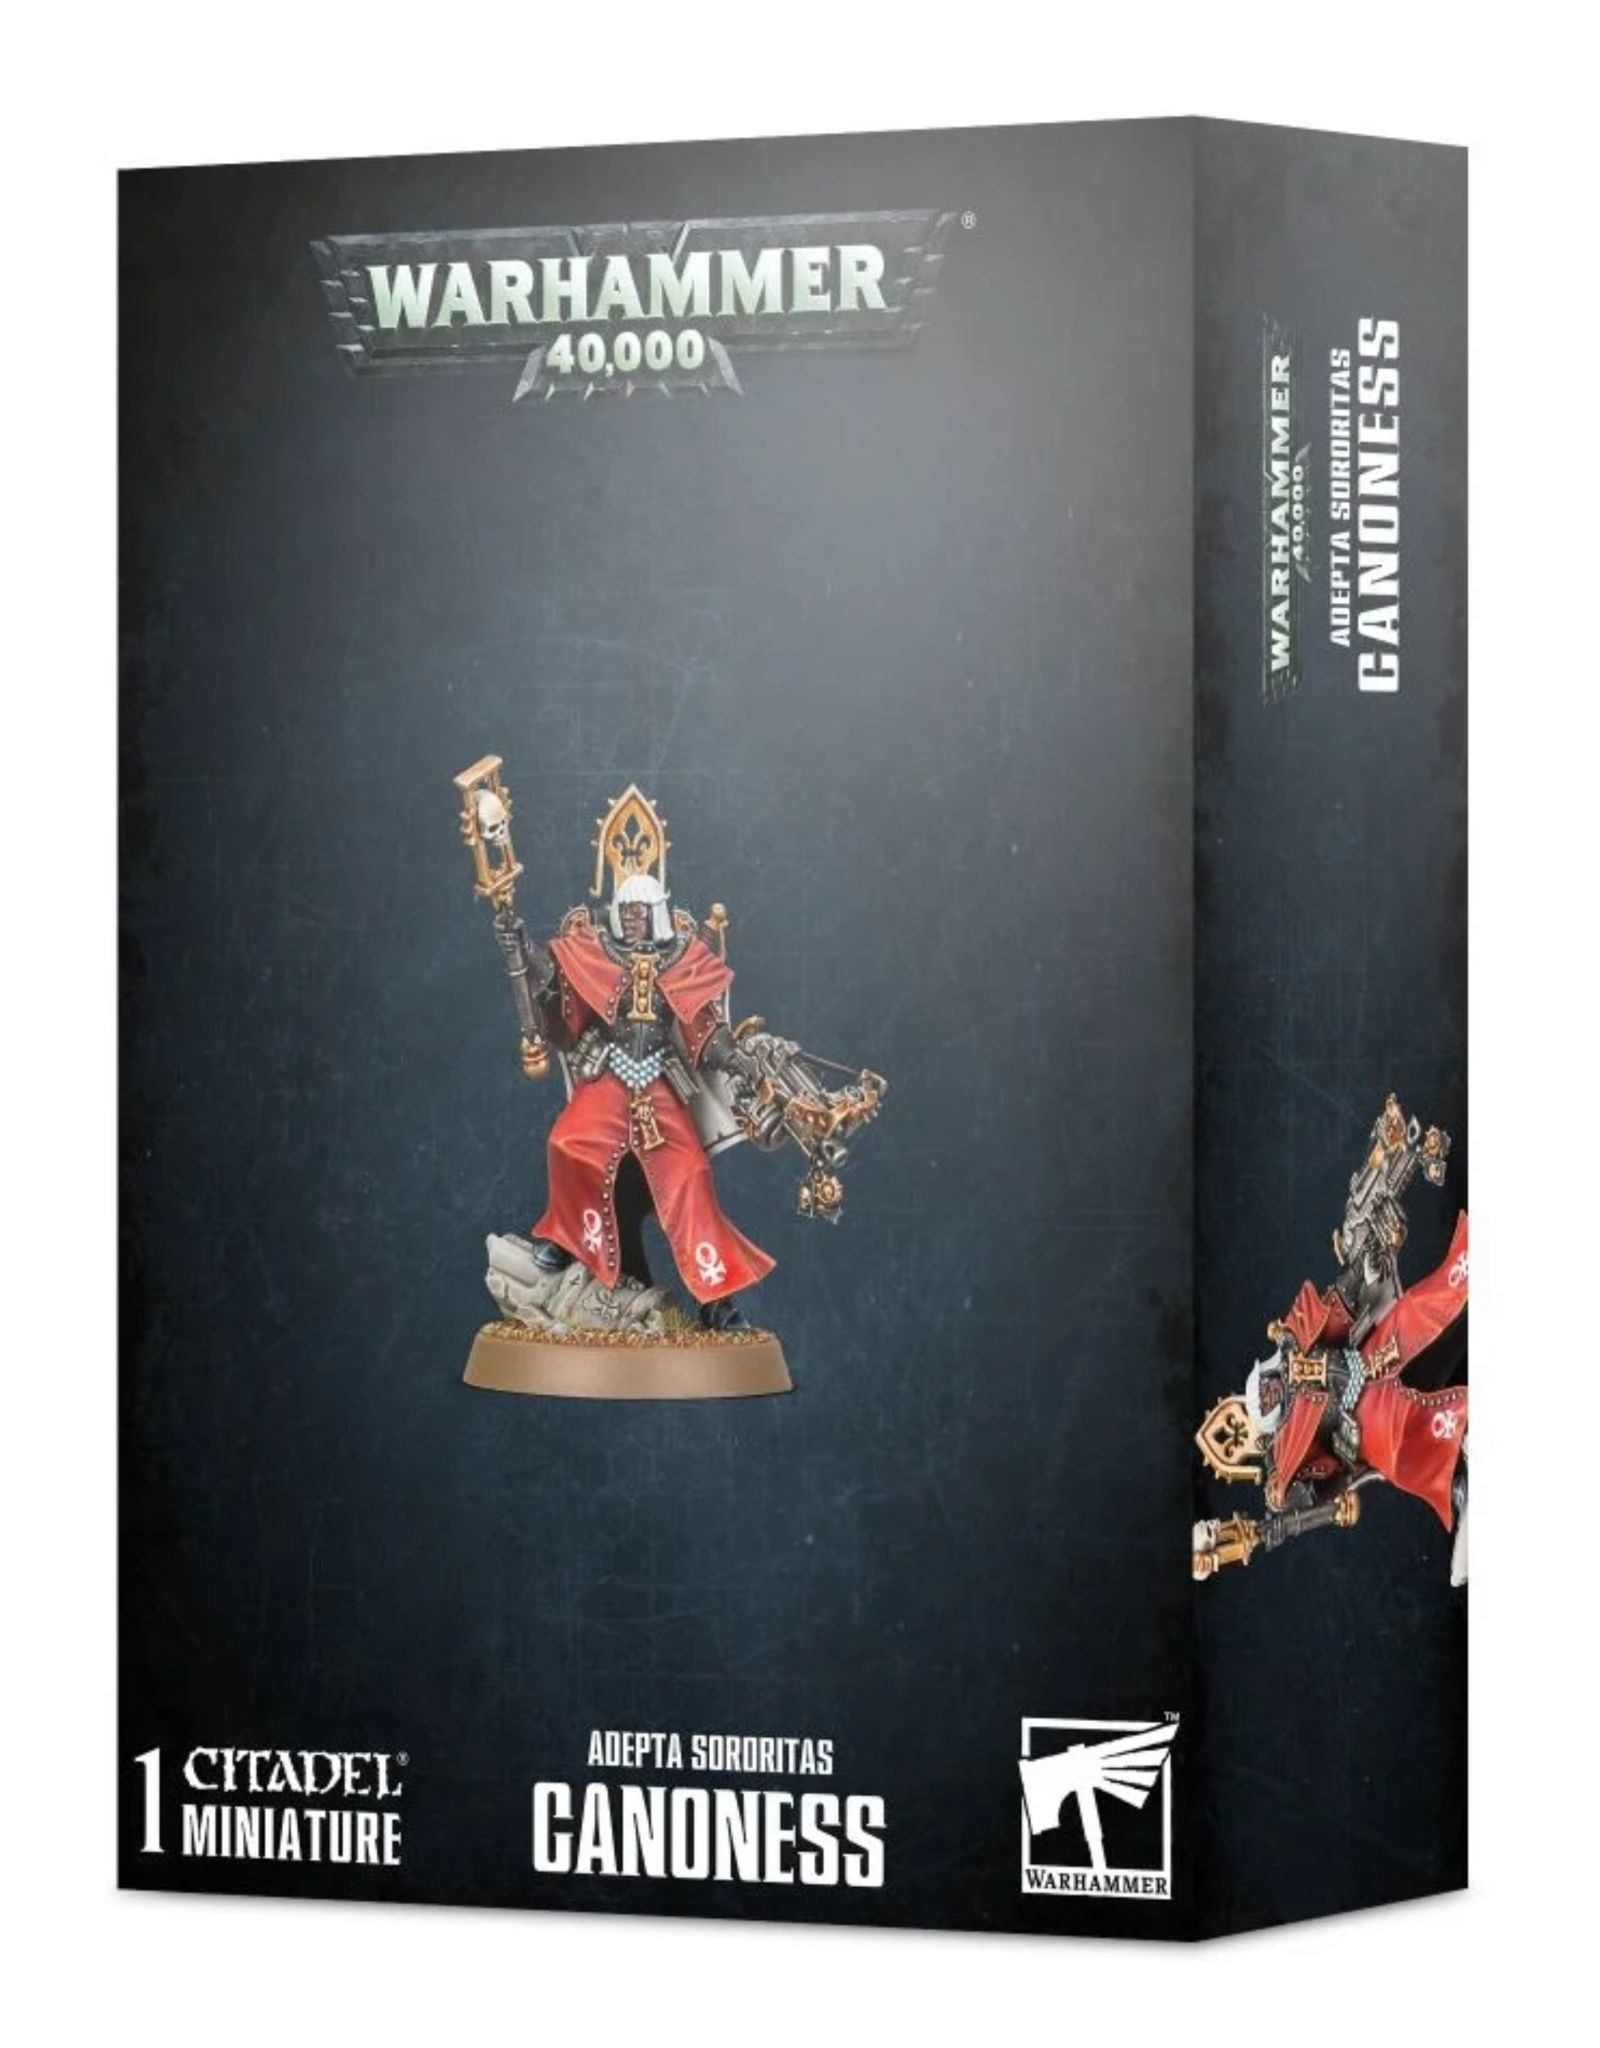 Warhammer 40k Canoness